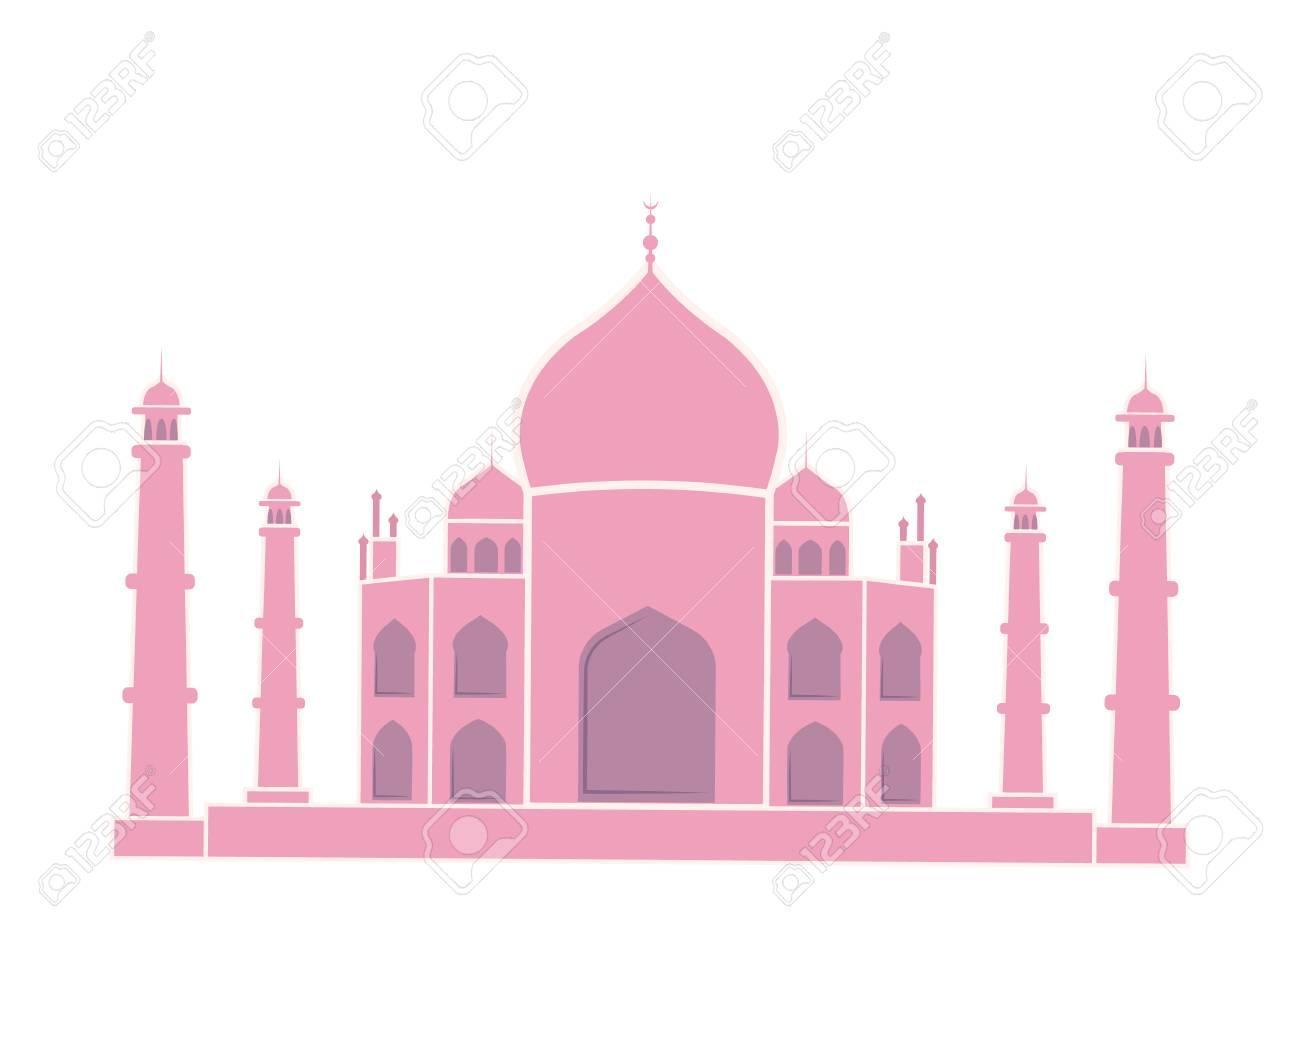 Taj Mahal Indian Landmark Travel Sticker Isolated - 113463088